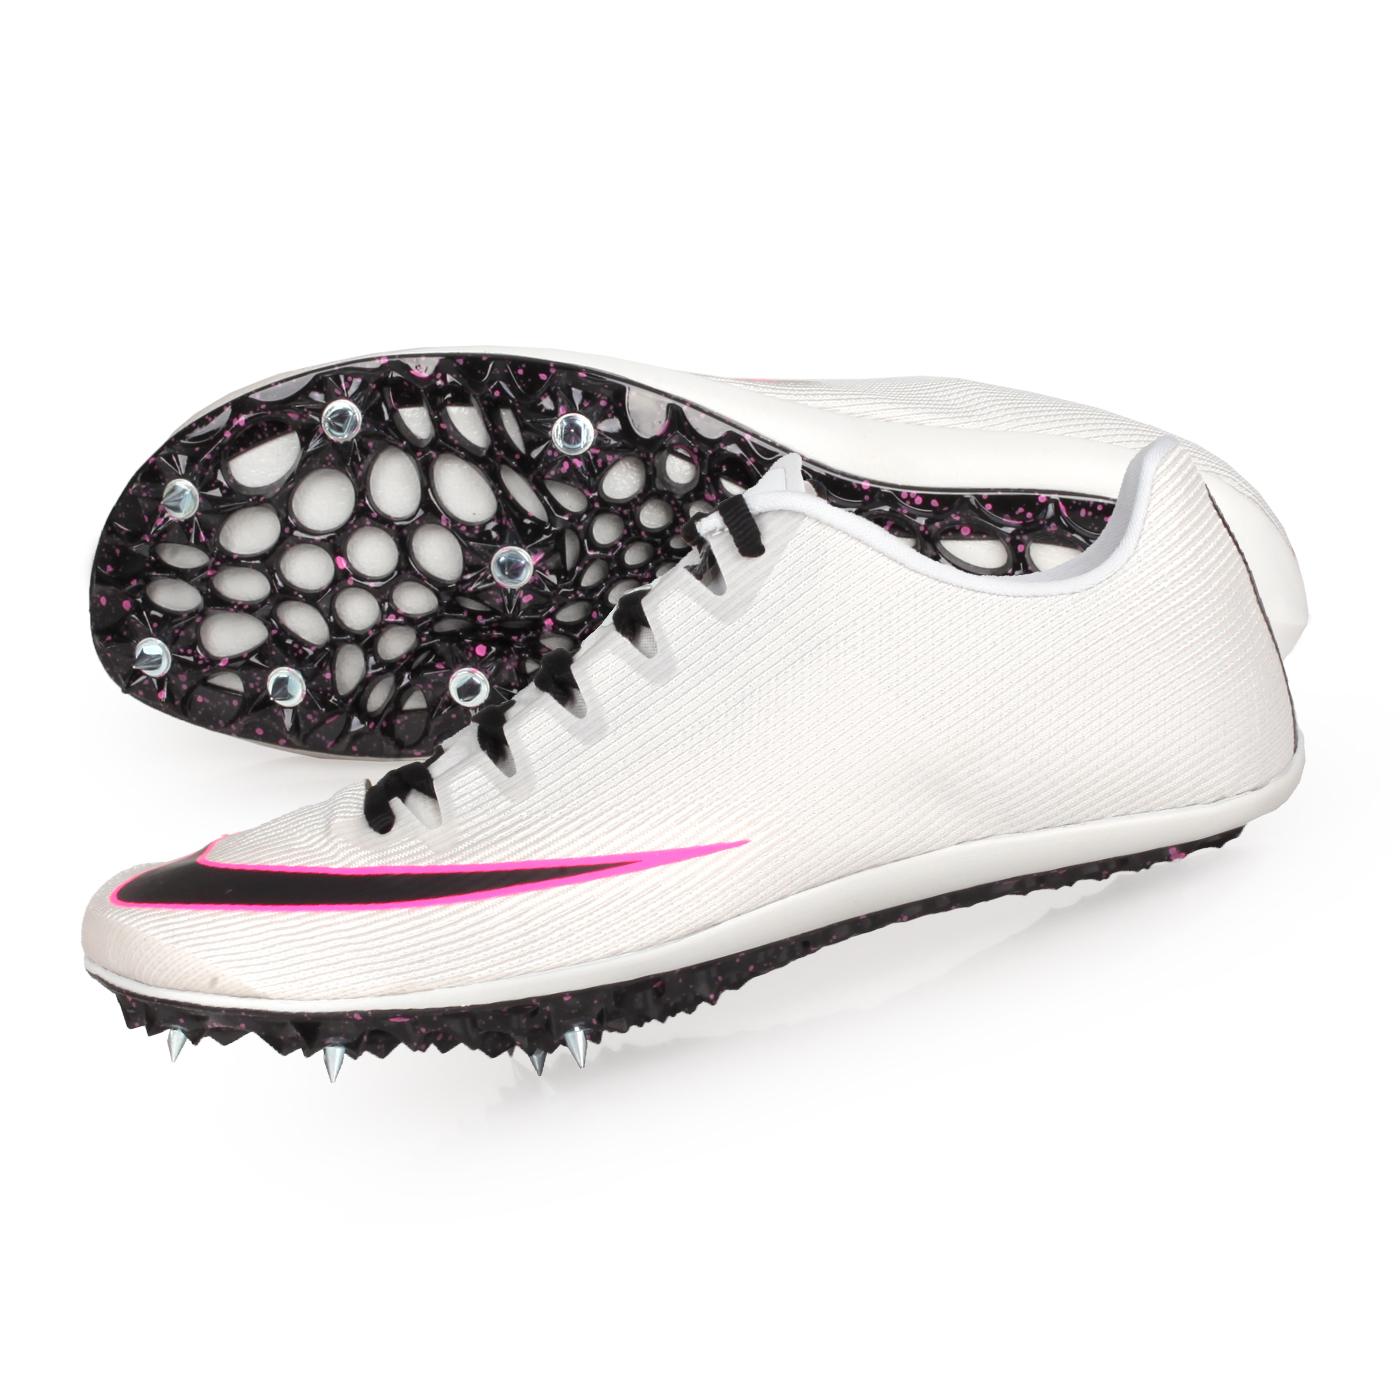 NIKE 田徑釘鞋(短距離)  @ZOOM 400@AA1205003 - 灰黑粉